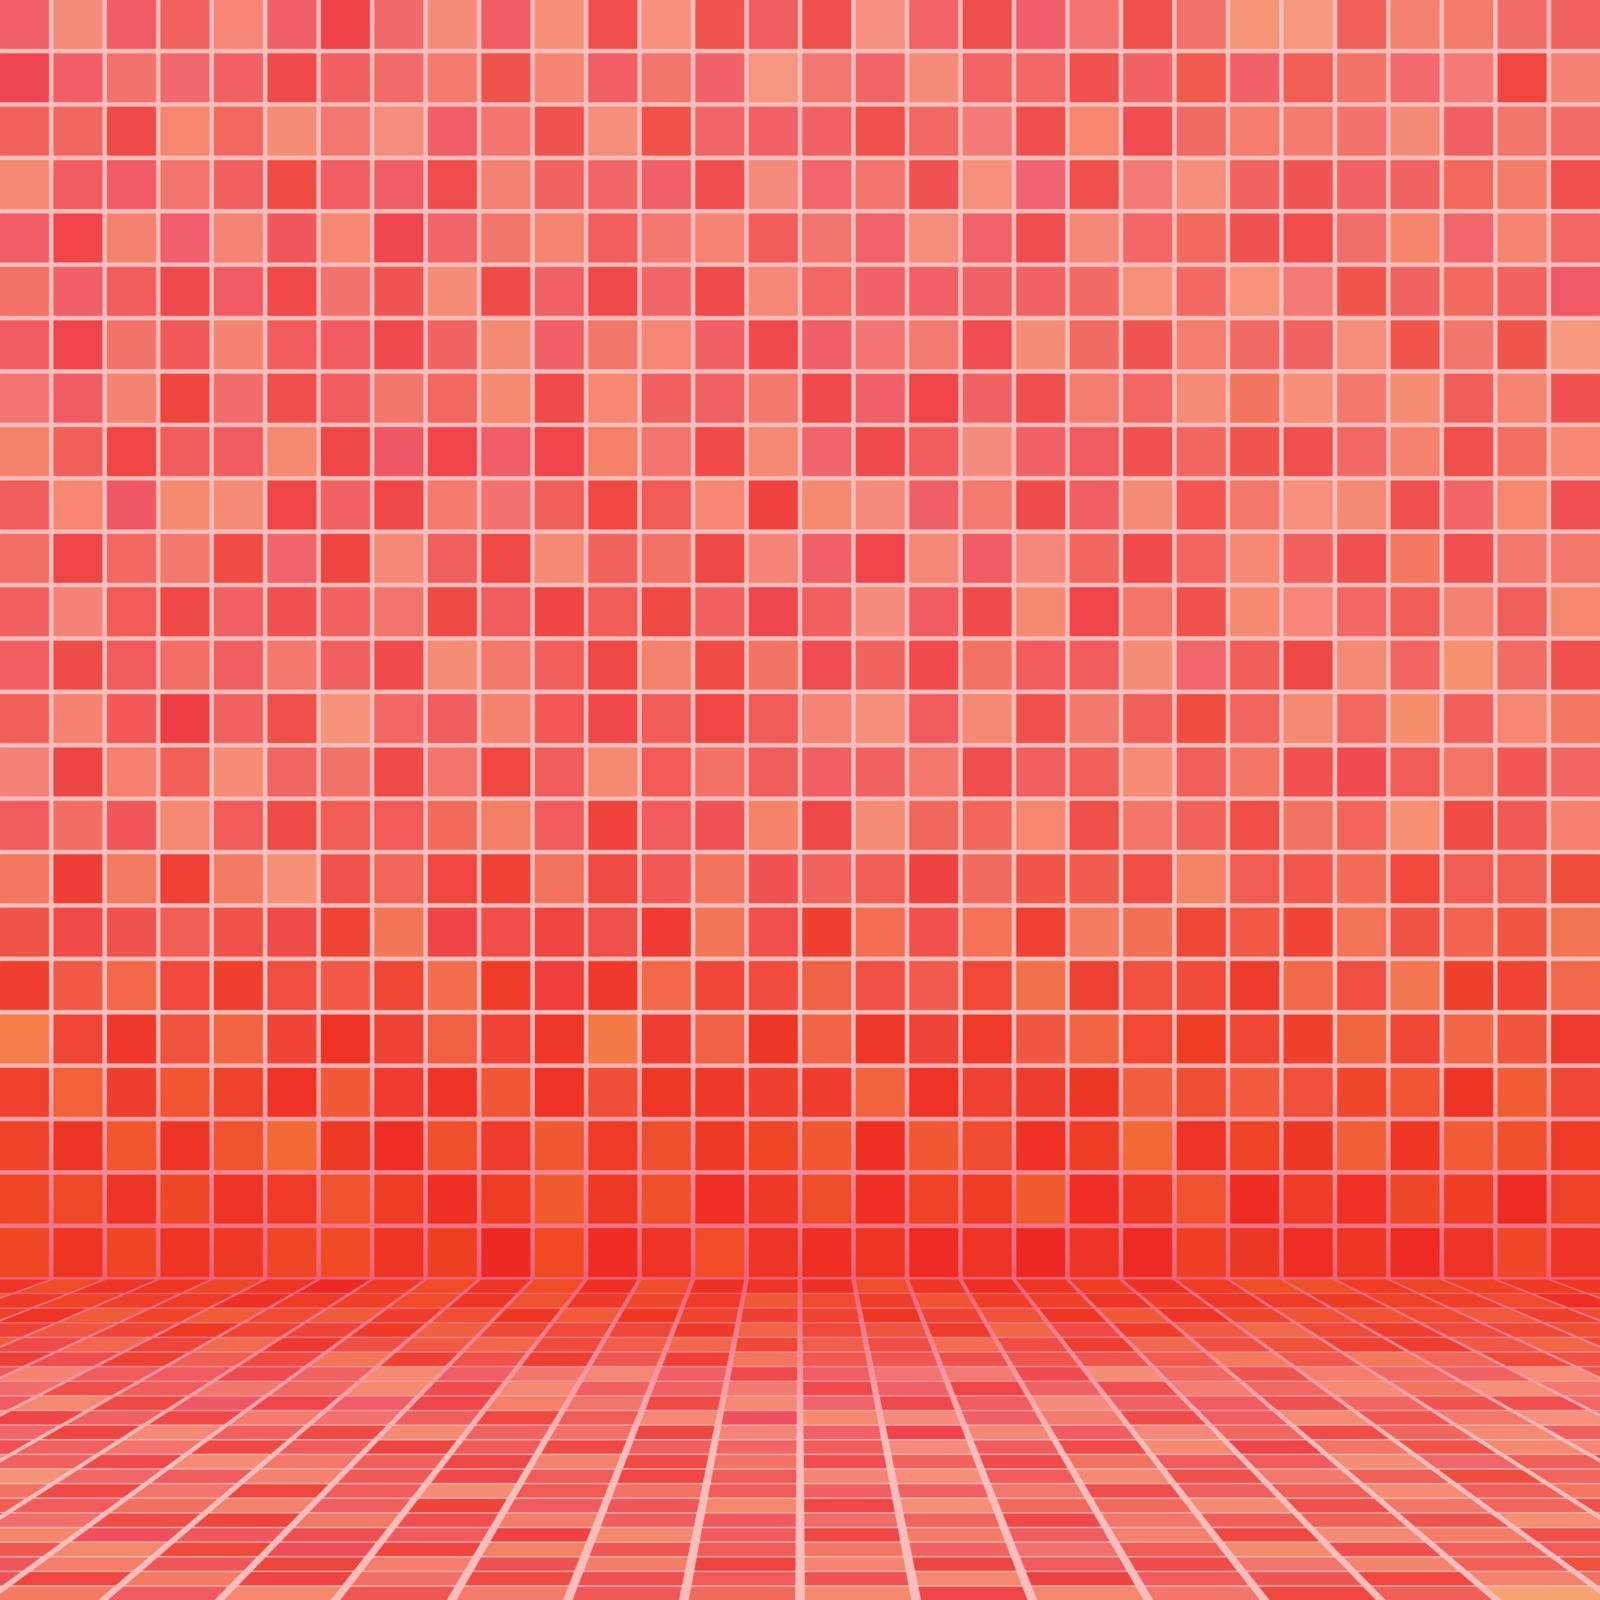 Red ceramic tile mosaic in swimming pool